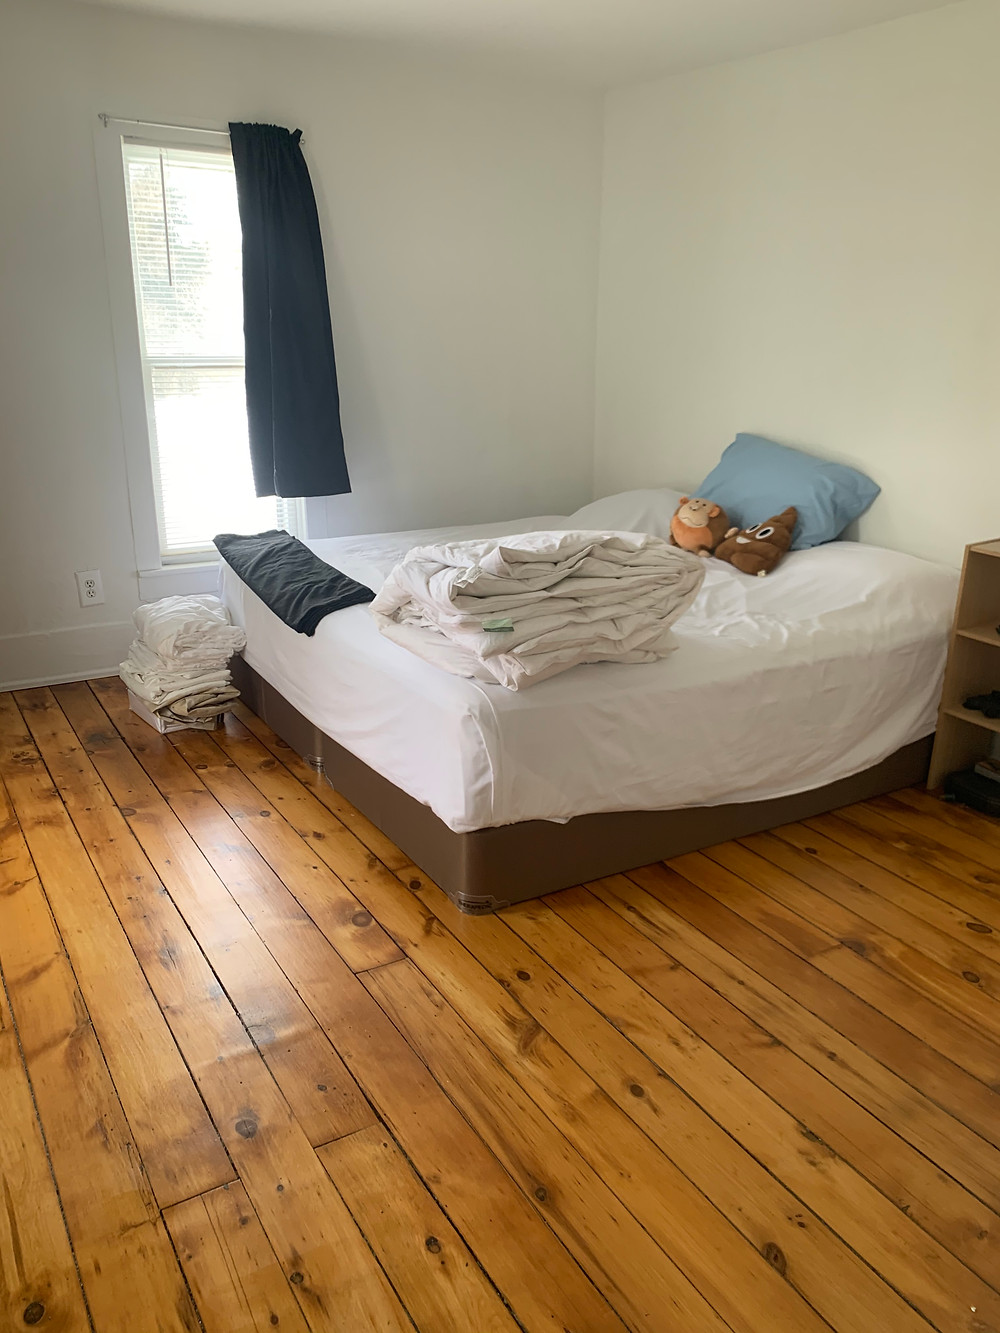 Heavy sanding destroys wear layer on hardwood flooring